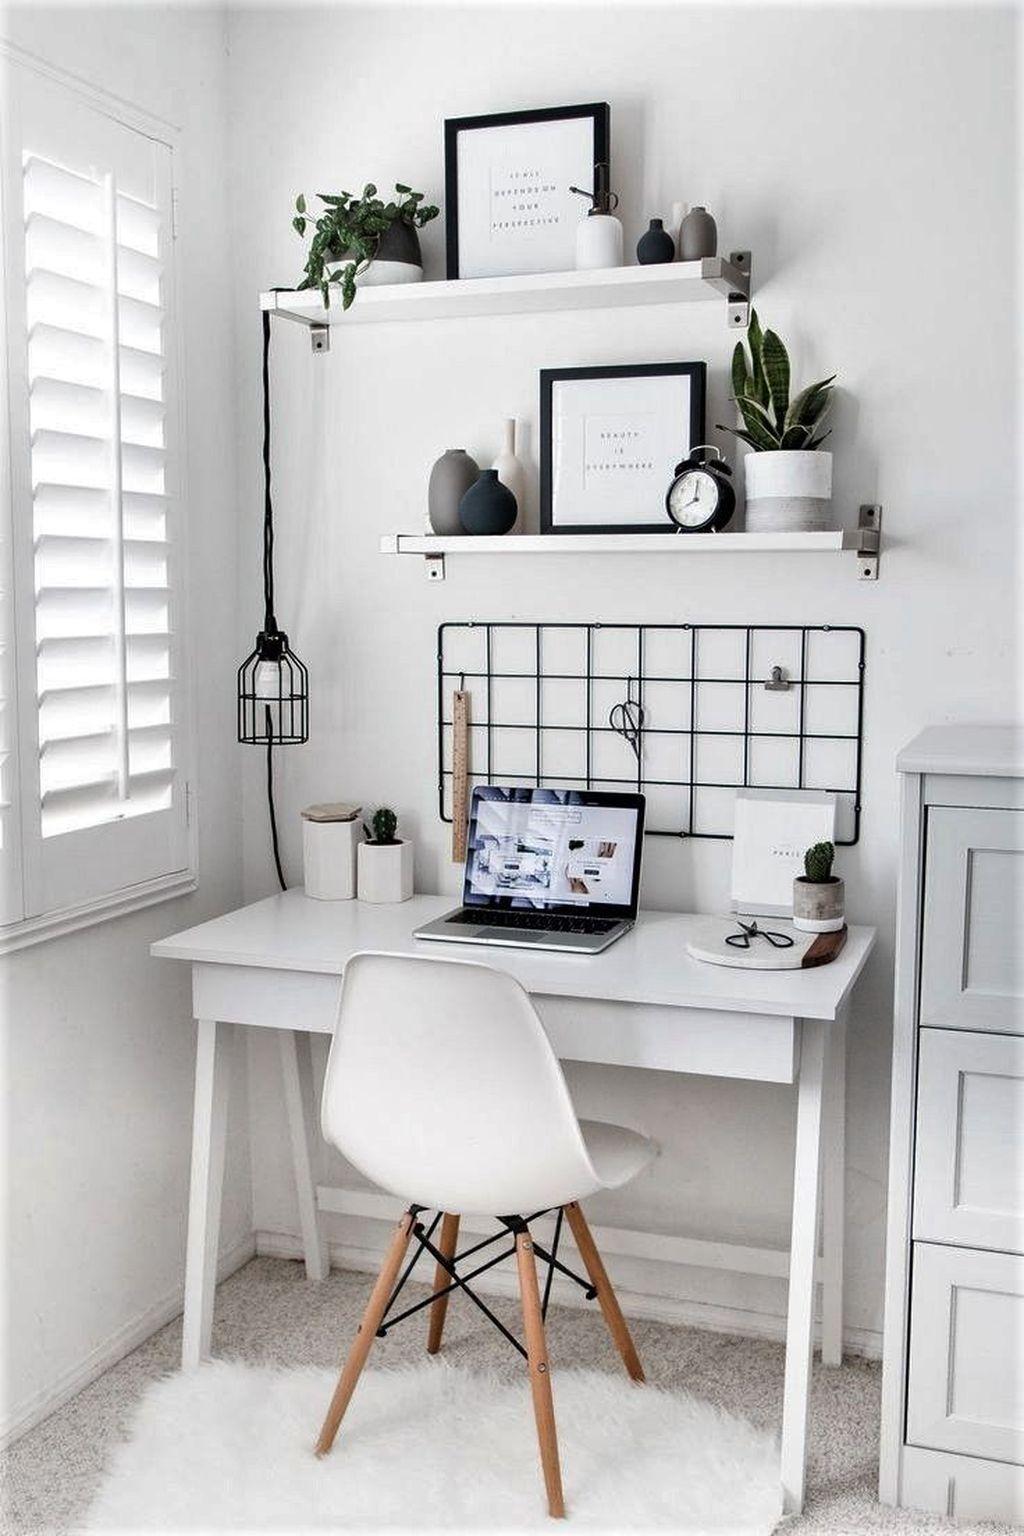 20 Minimalist Bedroom Decorating Ideas For Small Spaces Coodecor Minimalist Living Room Design Minimalist Home Decor Minimalist Living Room